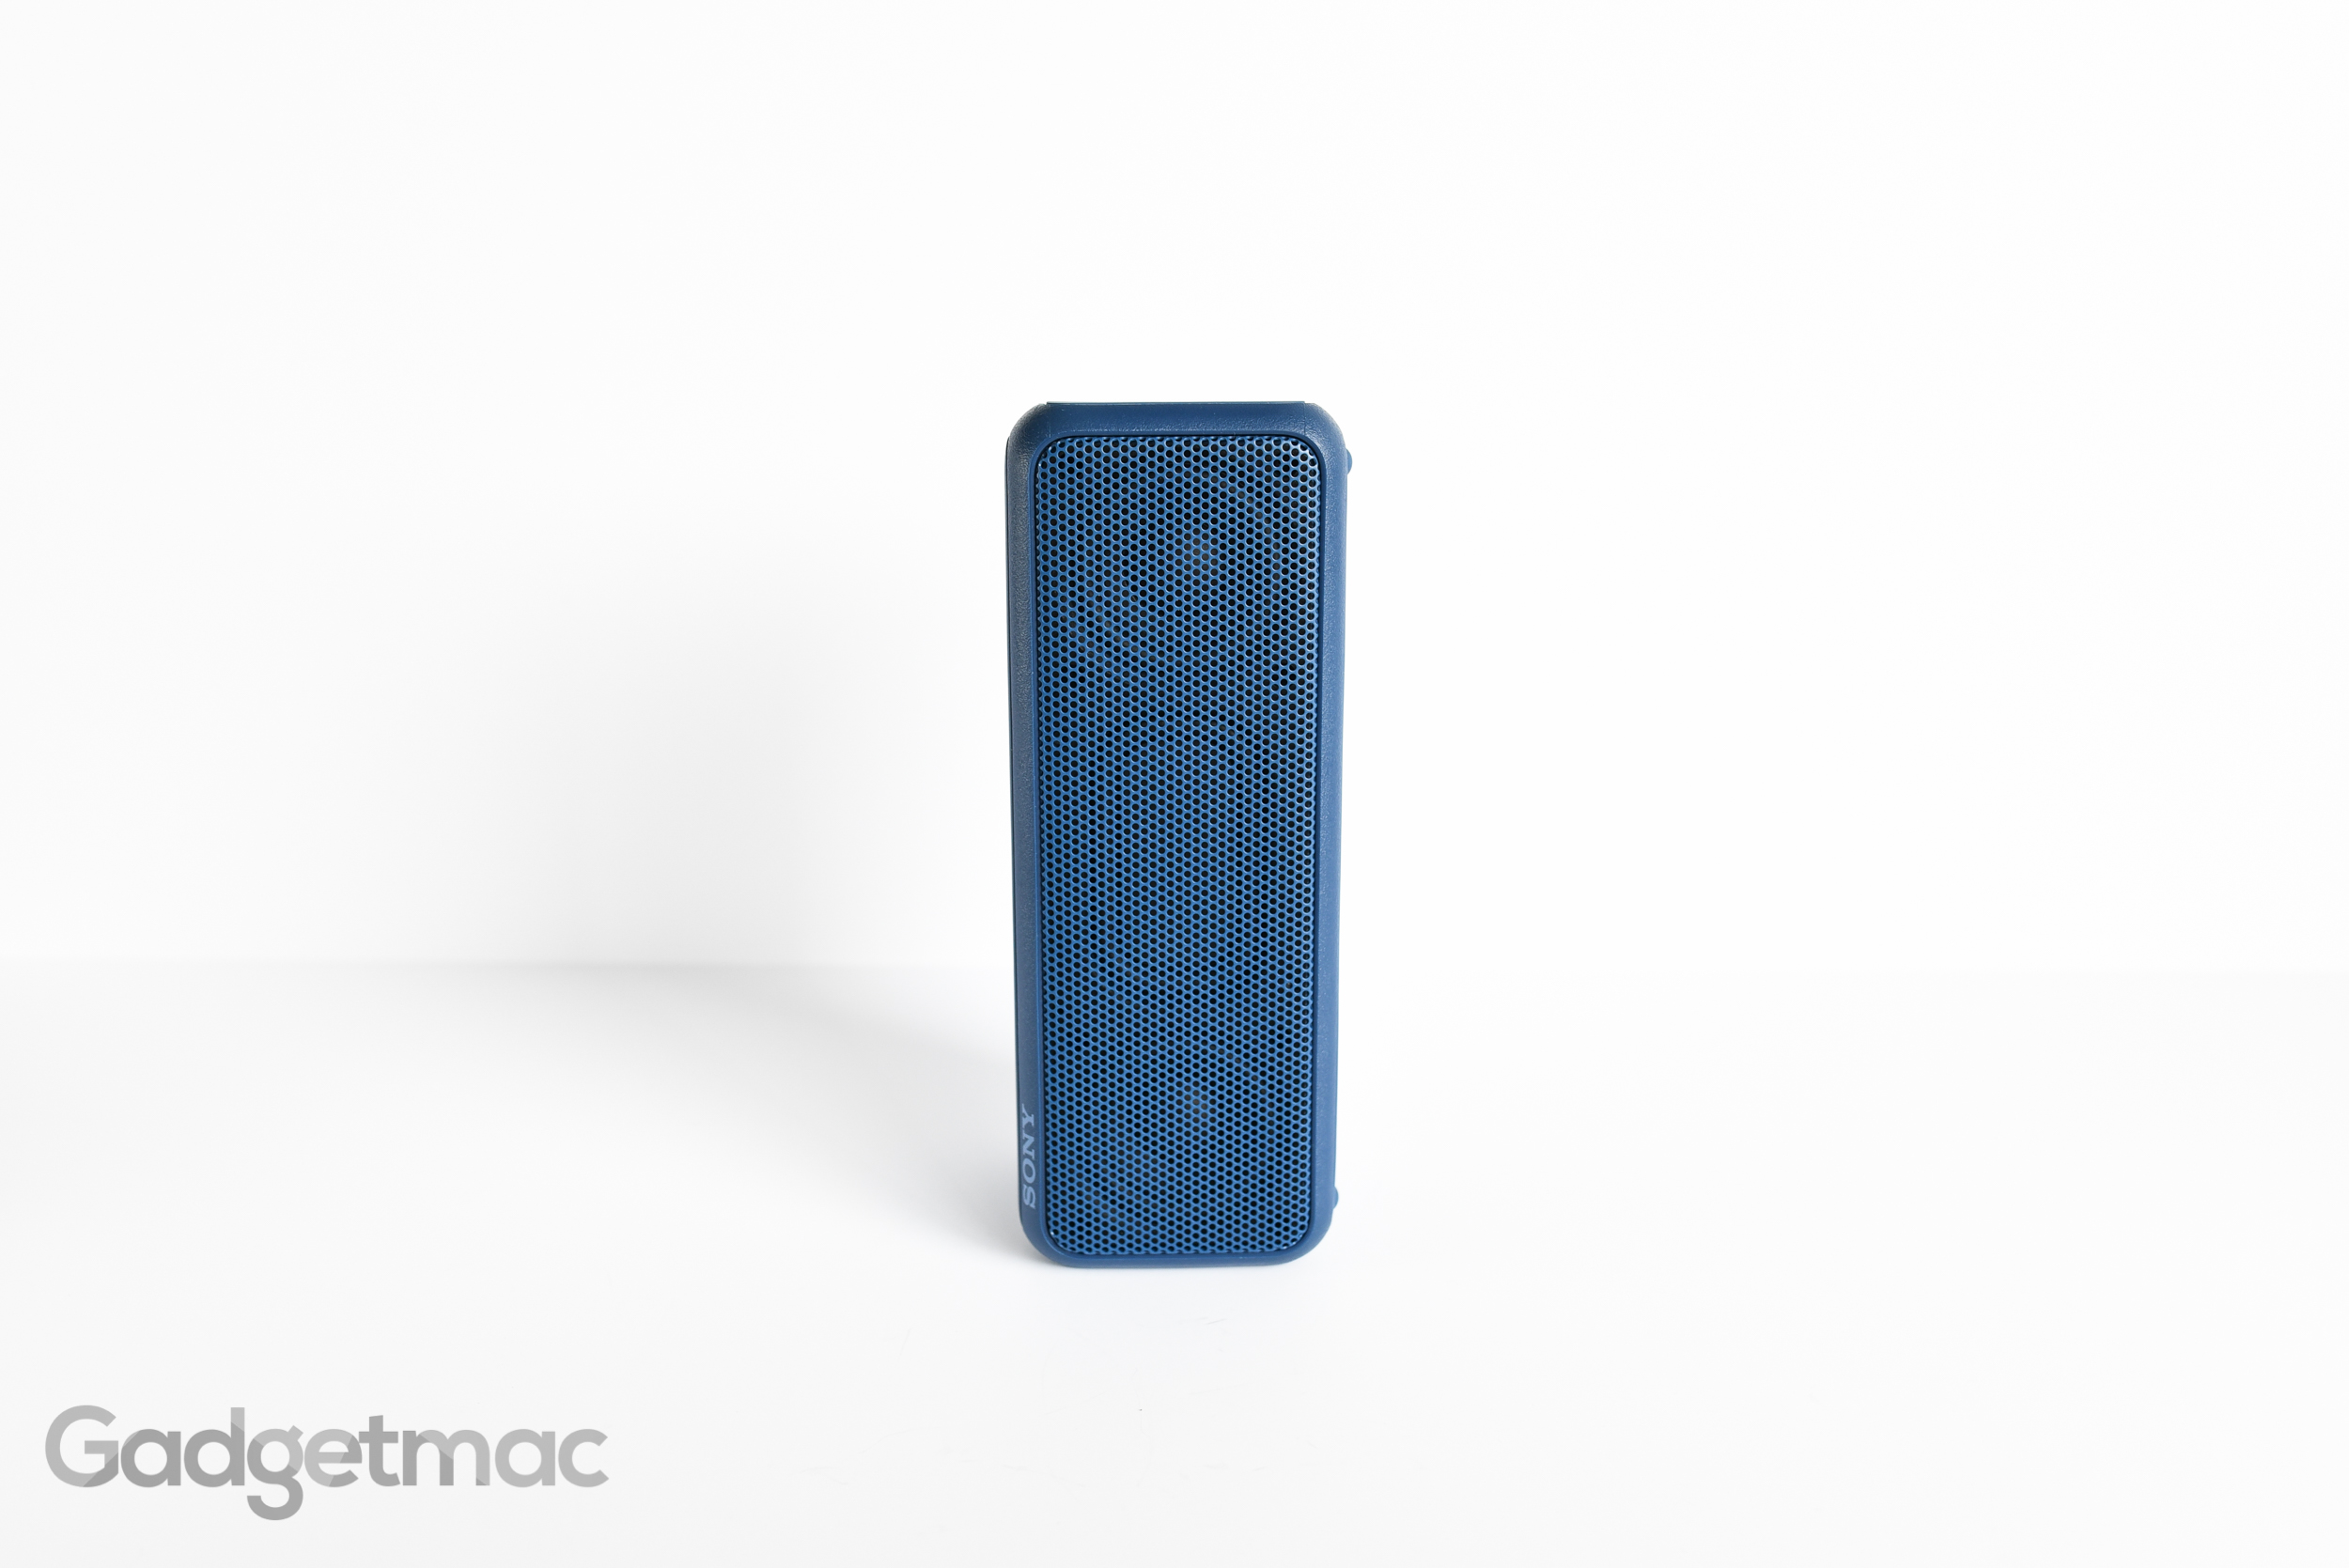 sony-srs-xb3-portable-speaker-upright.jpg